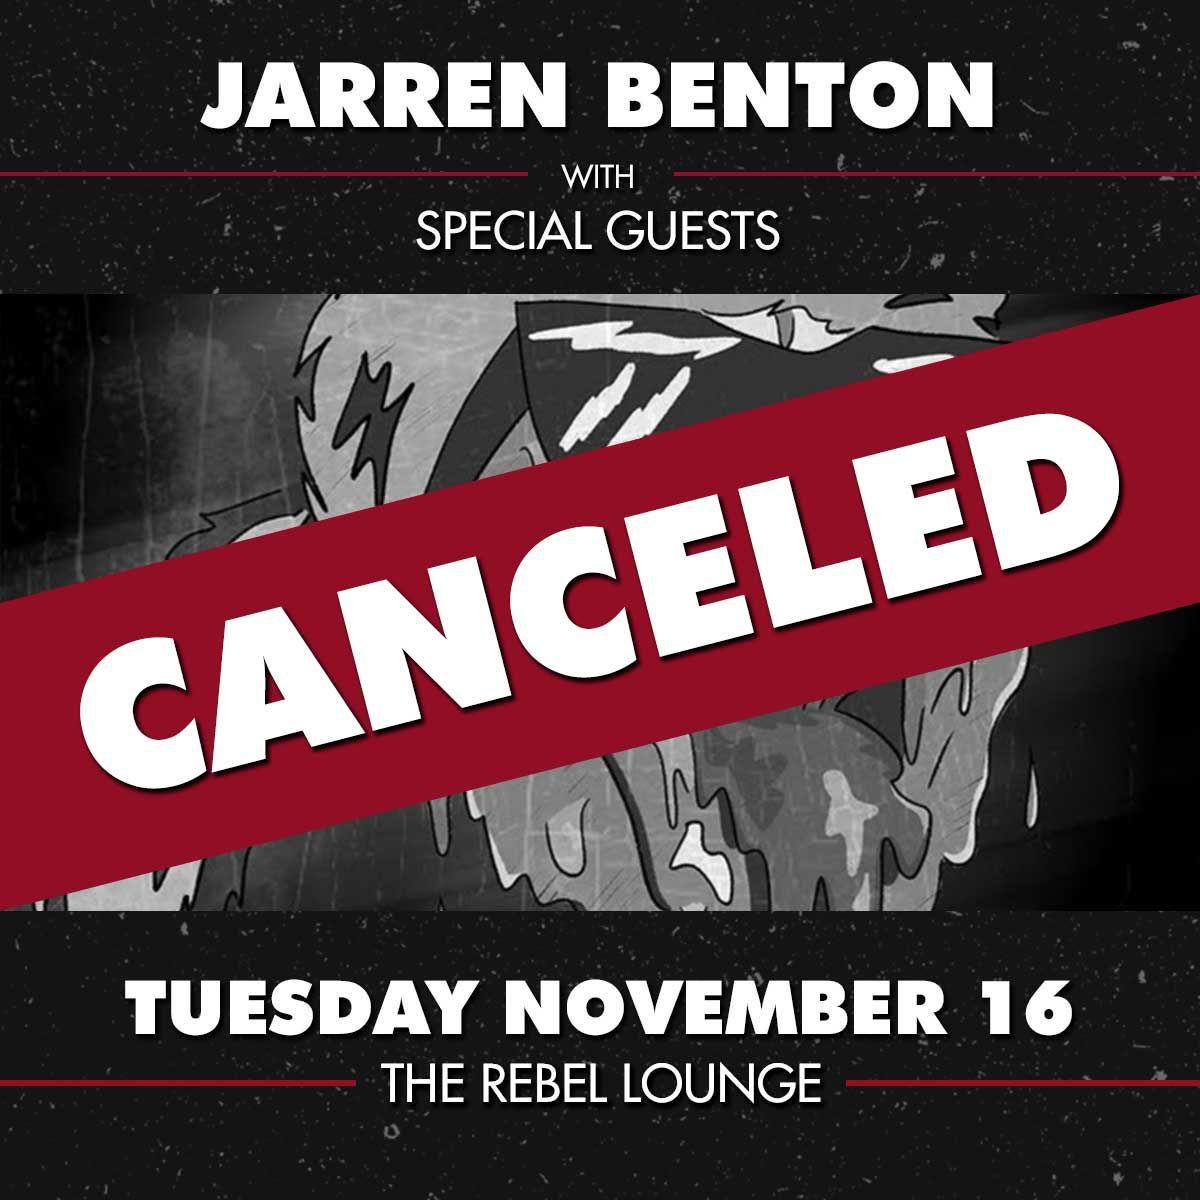 JARREN BENTON: CANCELLED: